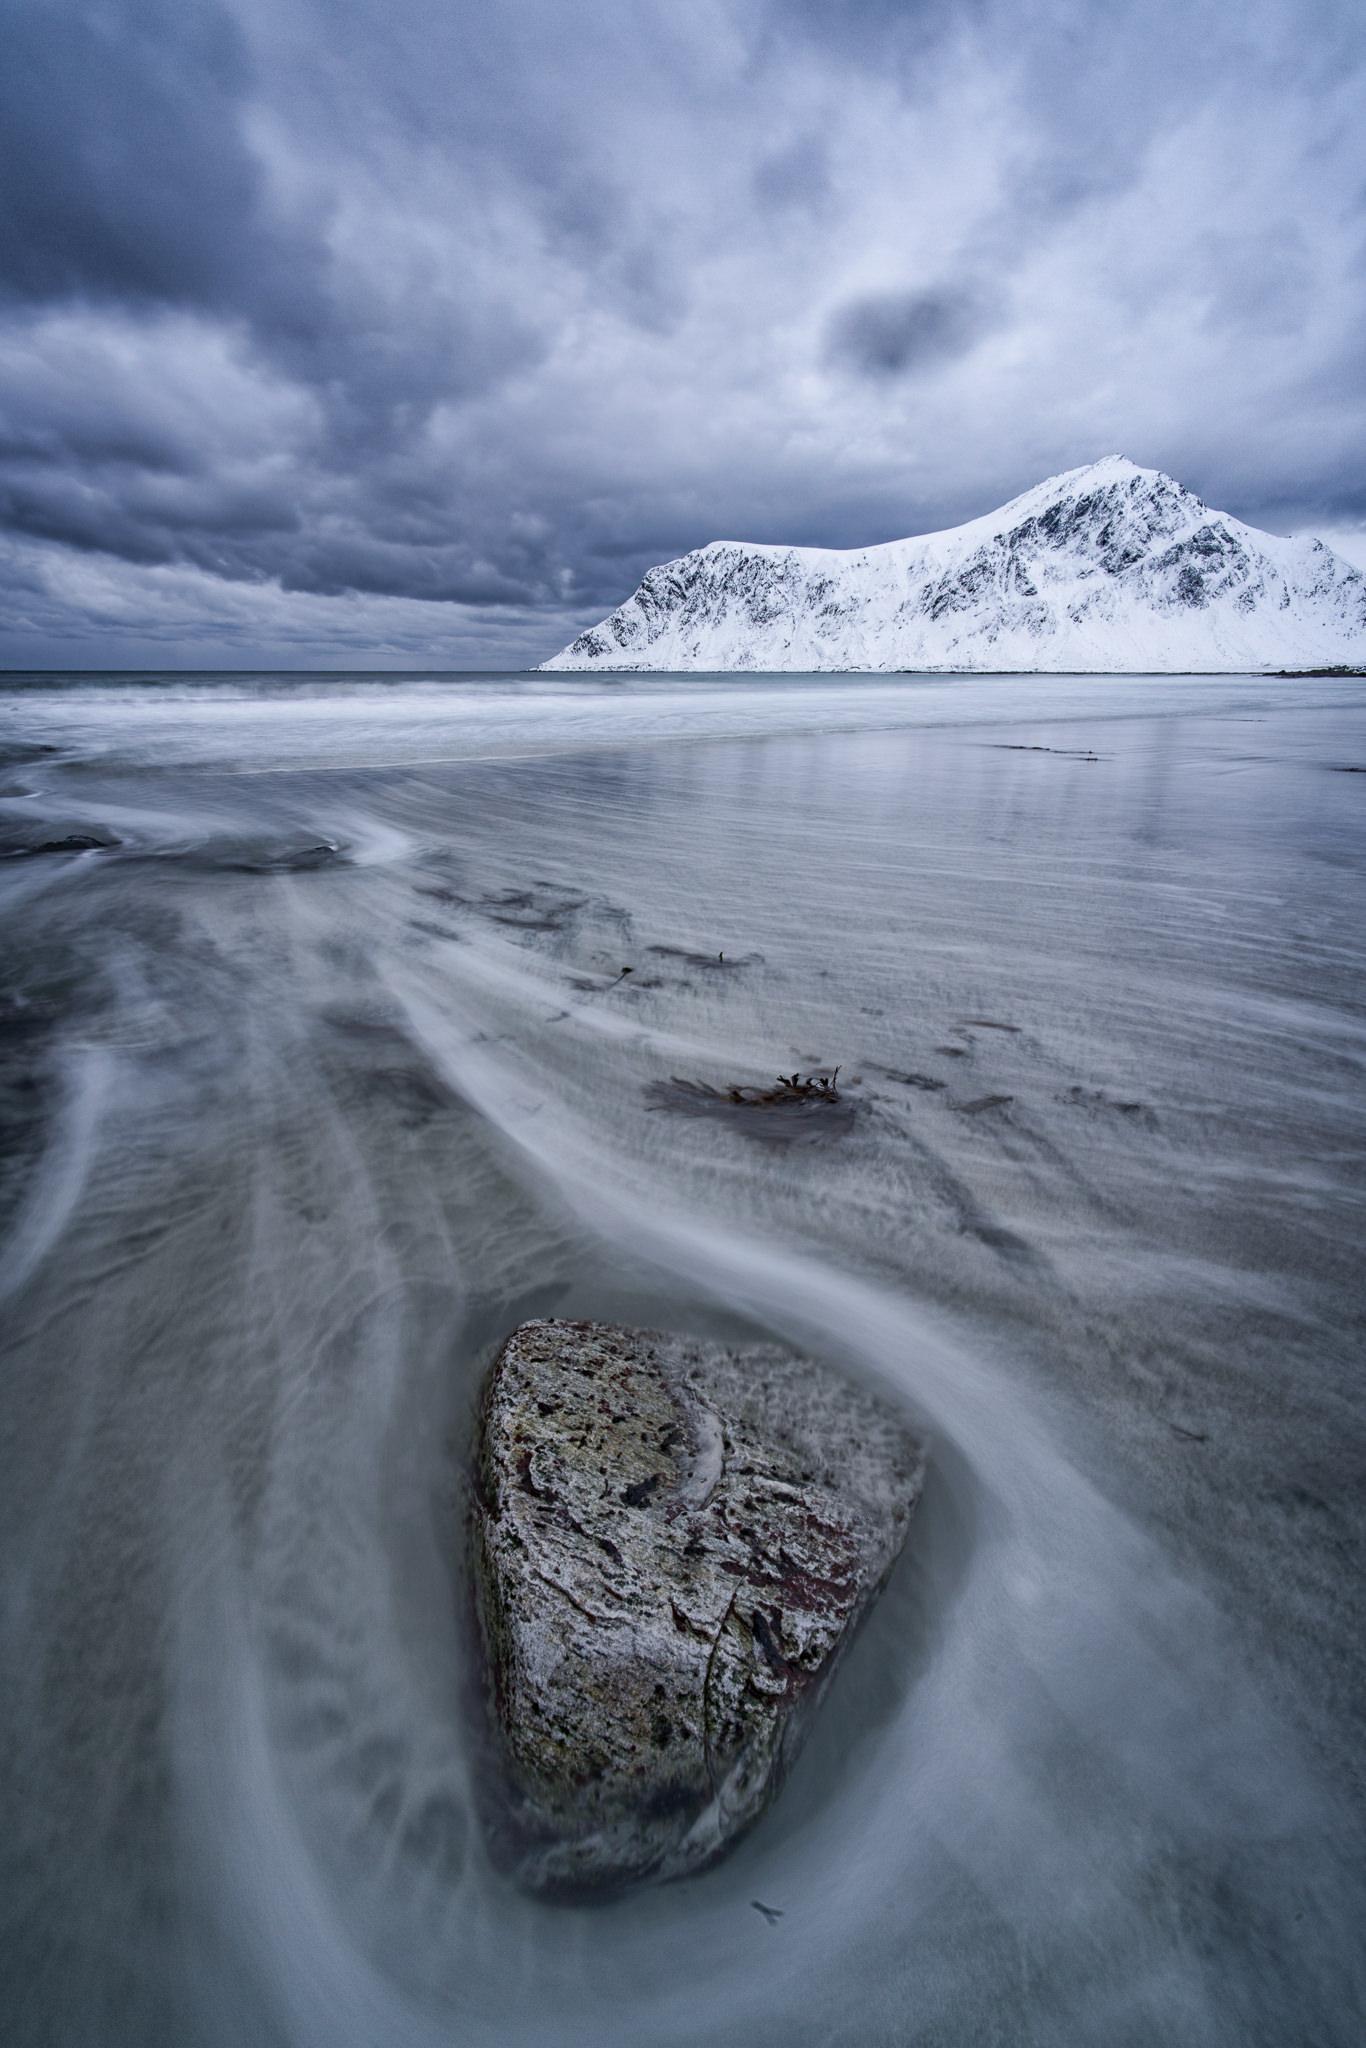 beach and stone